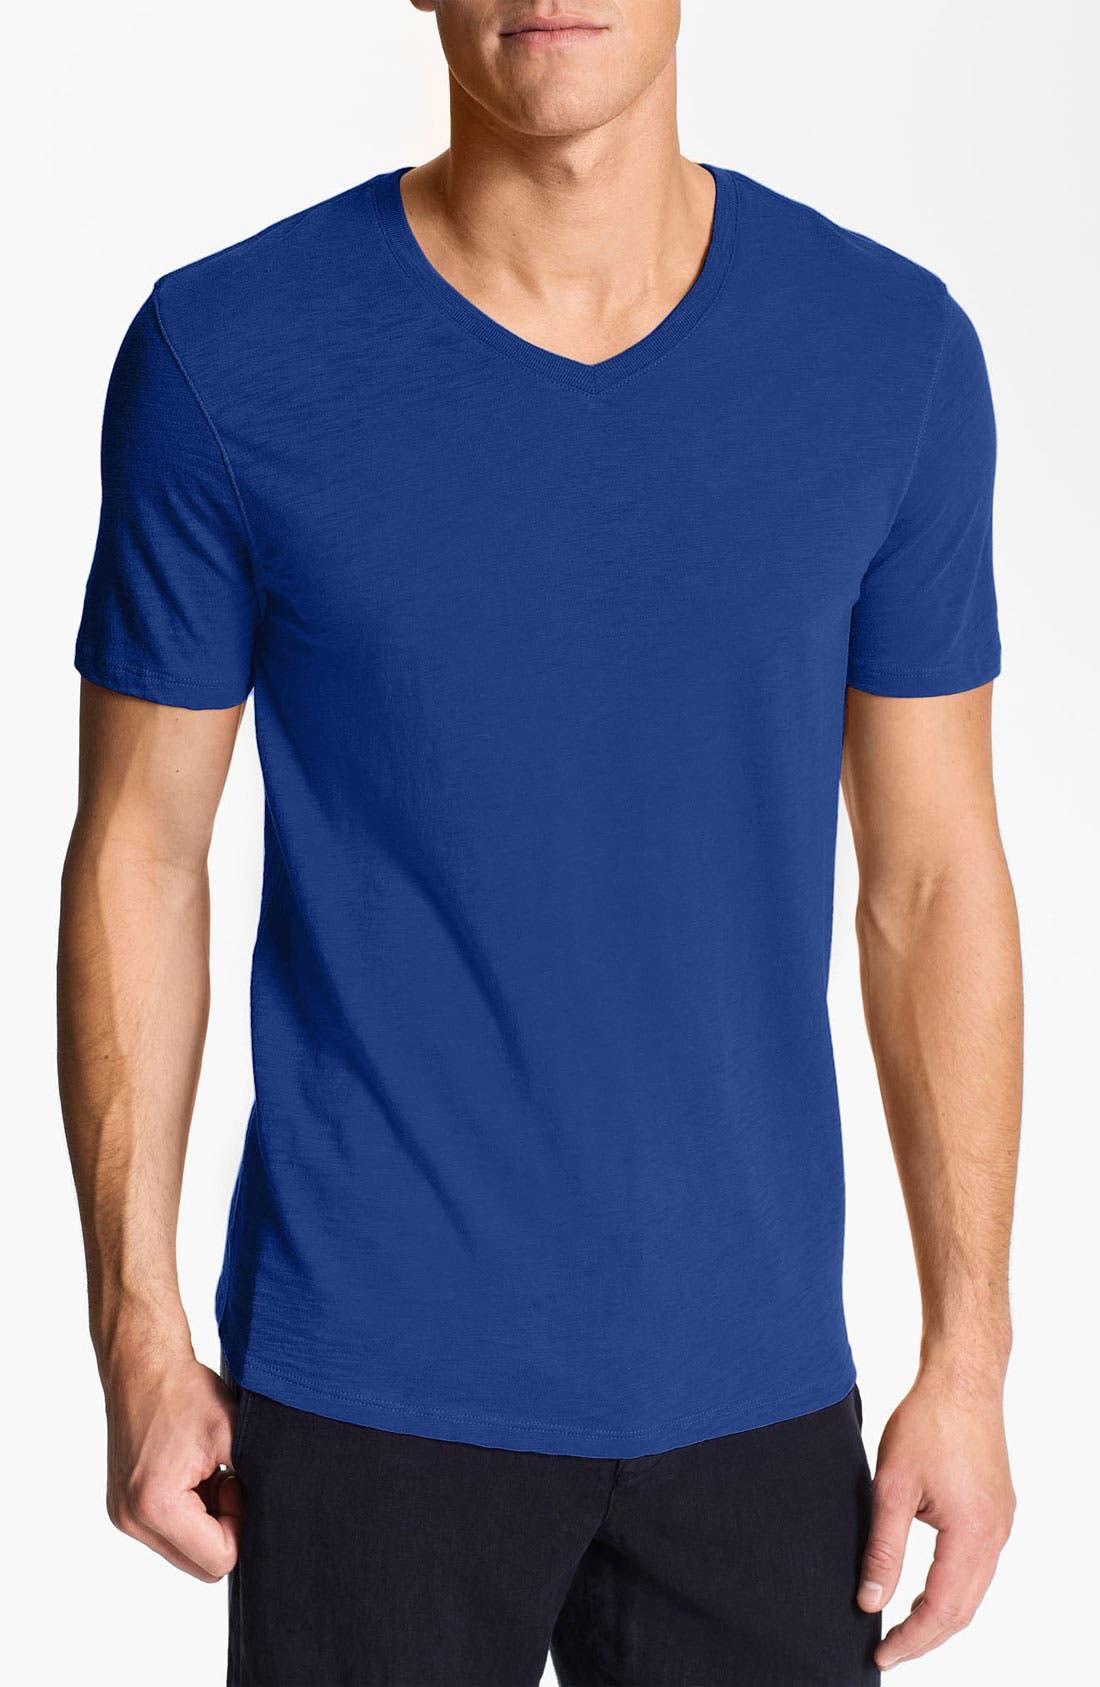 Main Image - Vince V-Neck Slub Knit T-Shirt